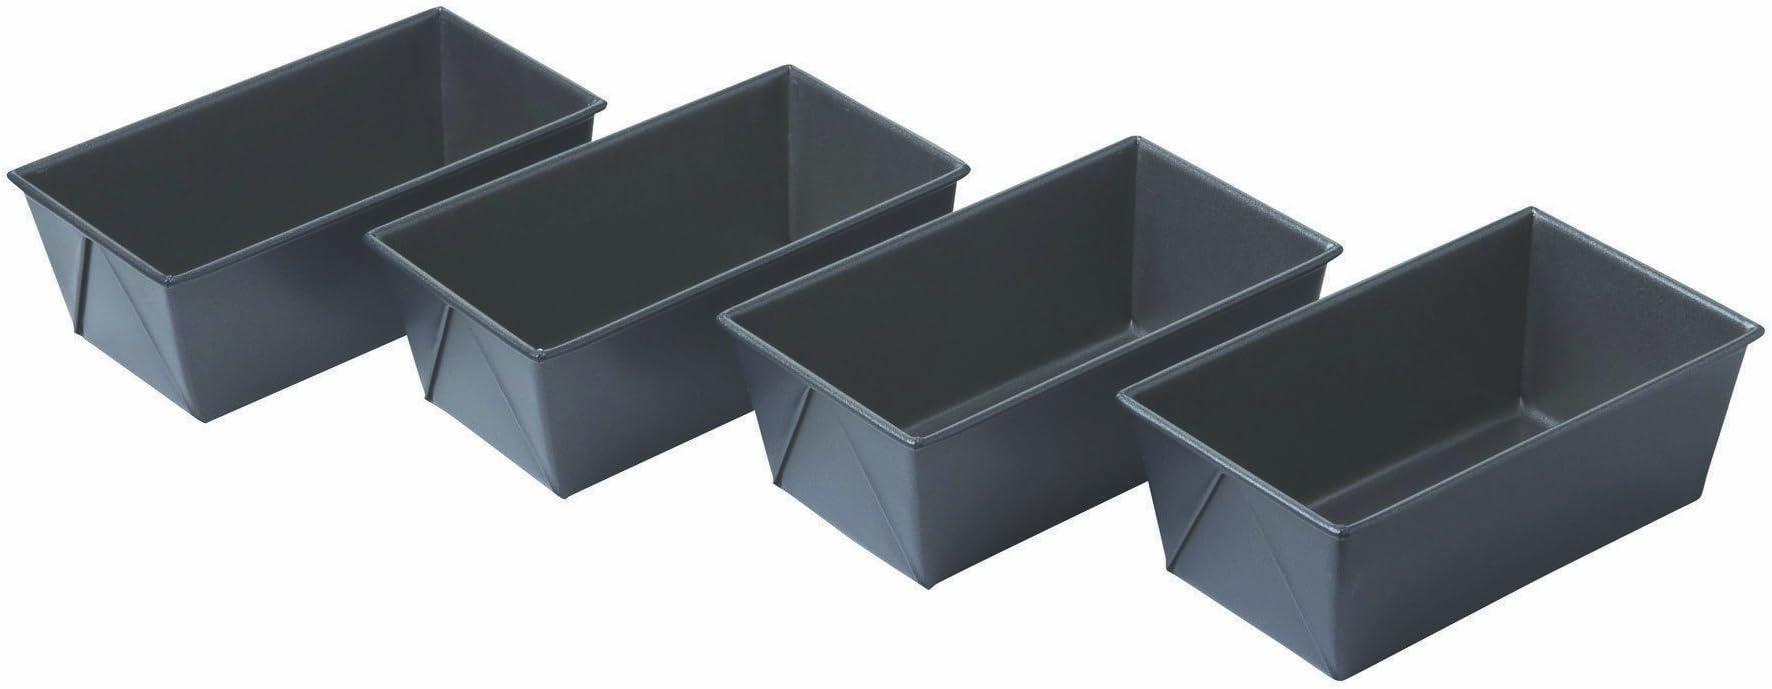 Chicago Metallic Non Stick Mini Loaf Pans, Set of 4